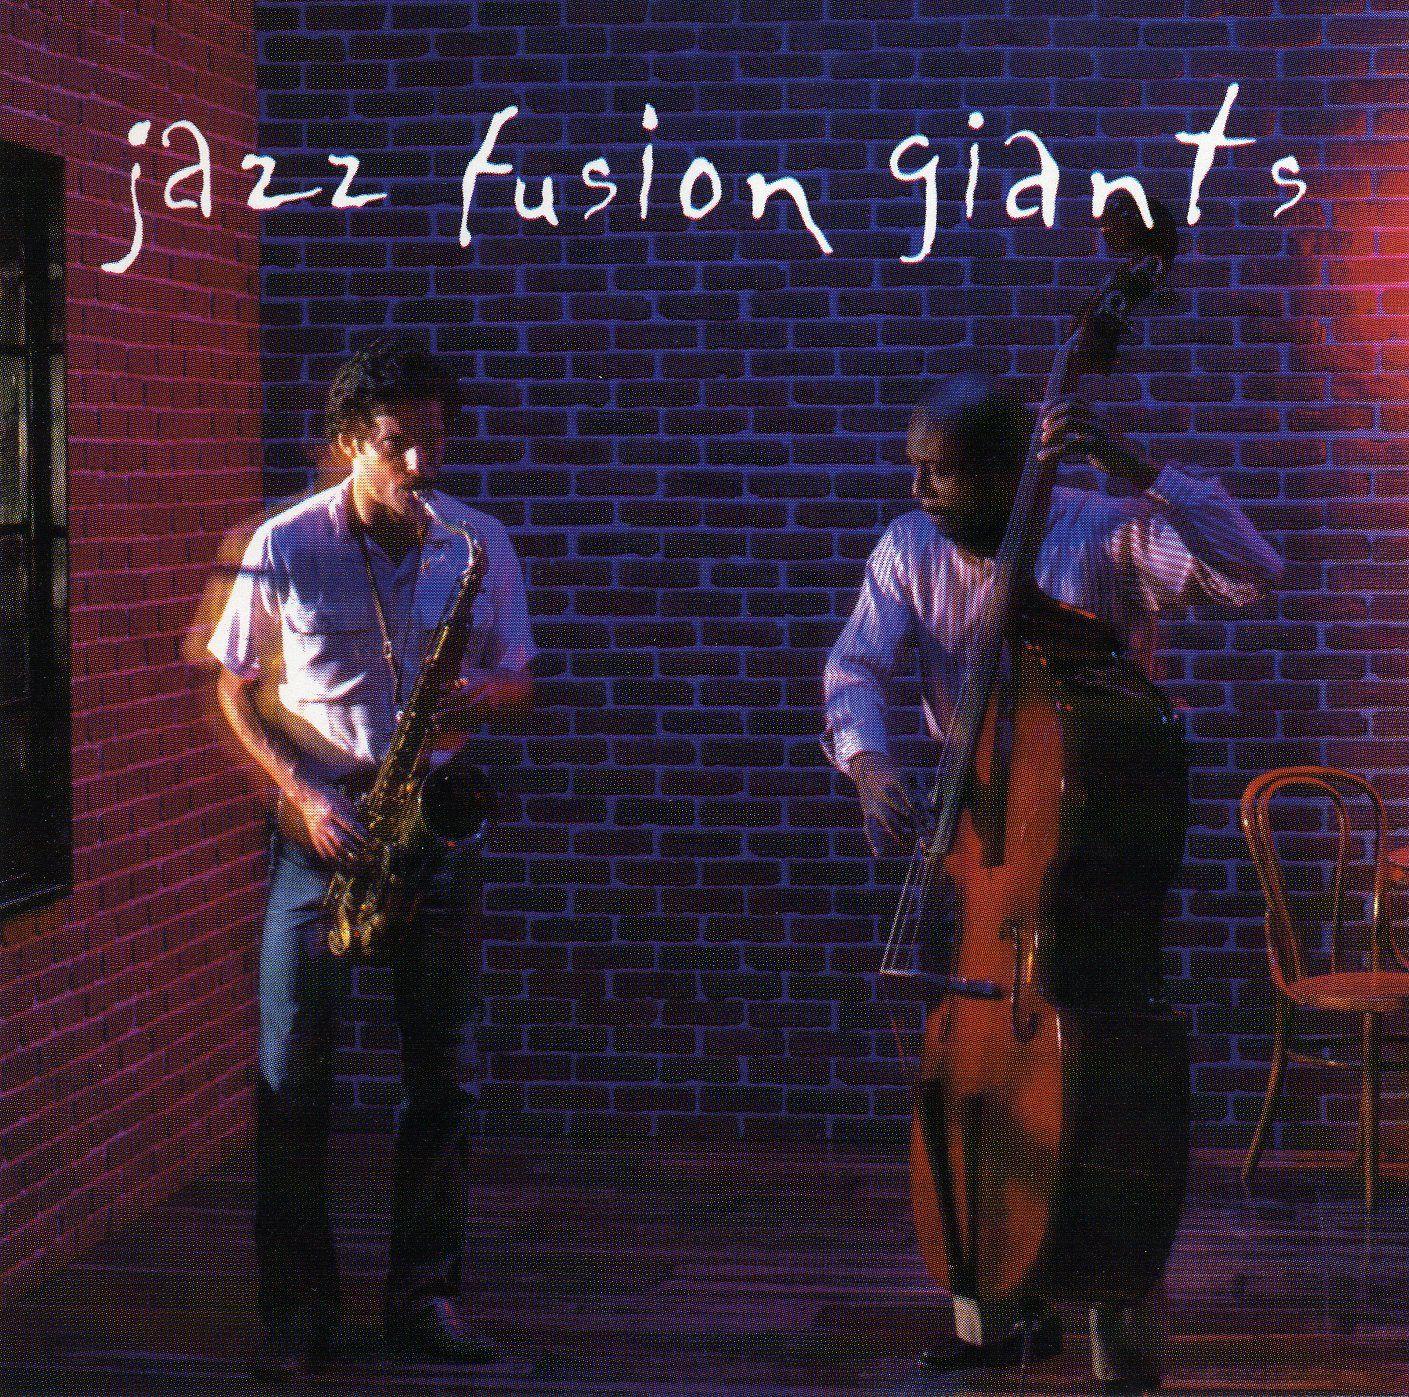 jazz rock fusion guitar various artists 1999 jazz fusion giants. Black Bedroom Furniture Sets. Home Design Ideas